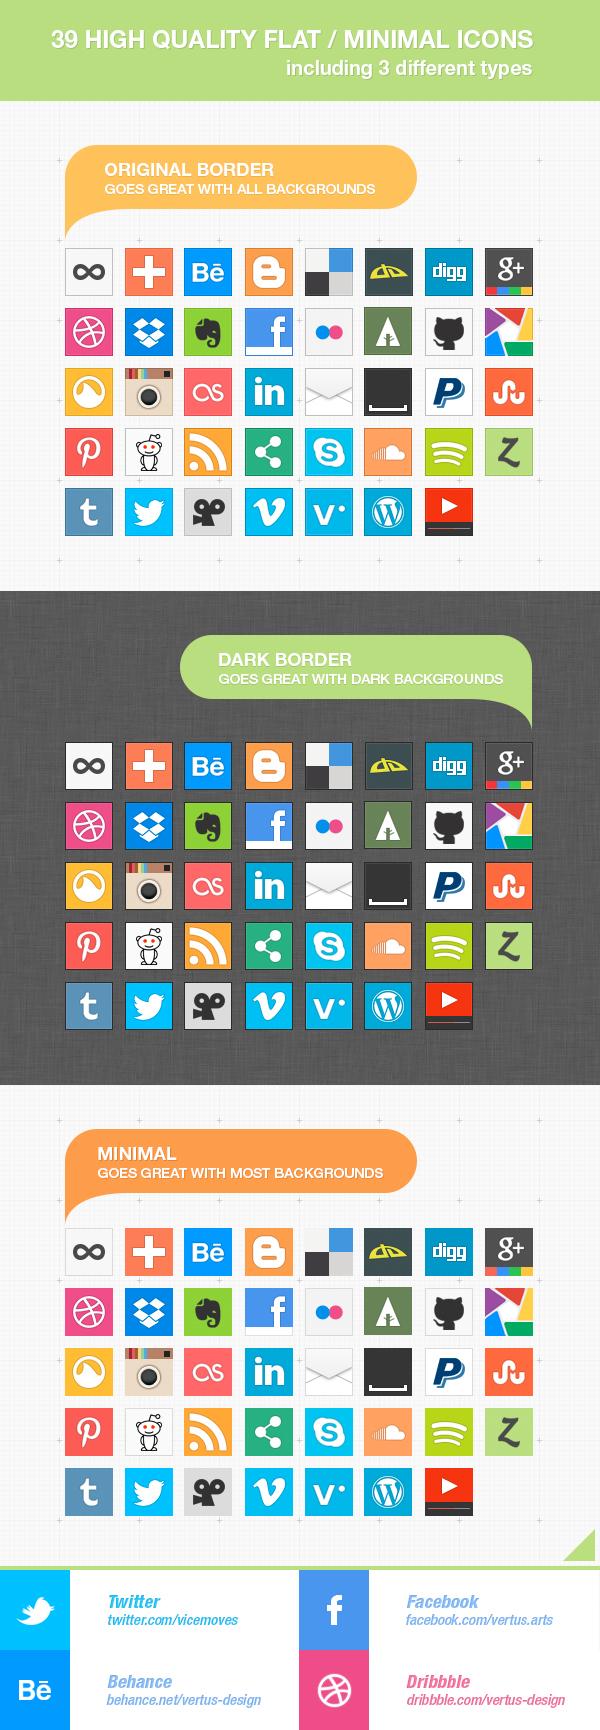 39 Free HQ FLAT Minimal Social Icons by vertus-design